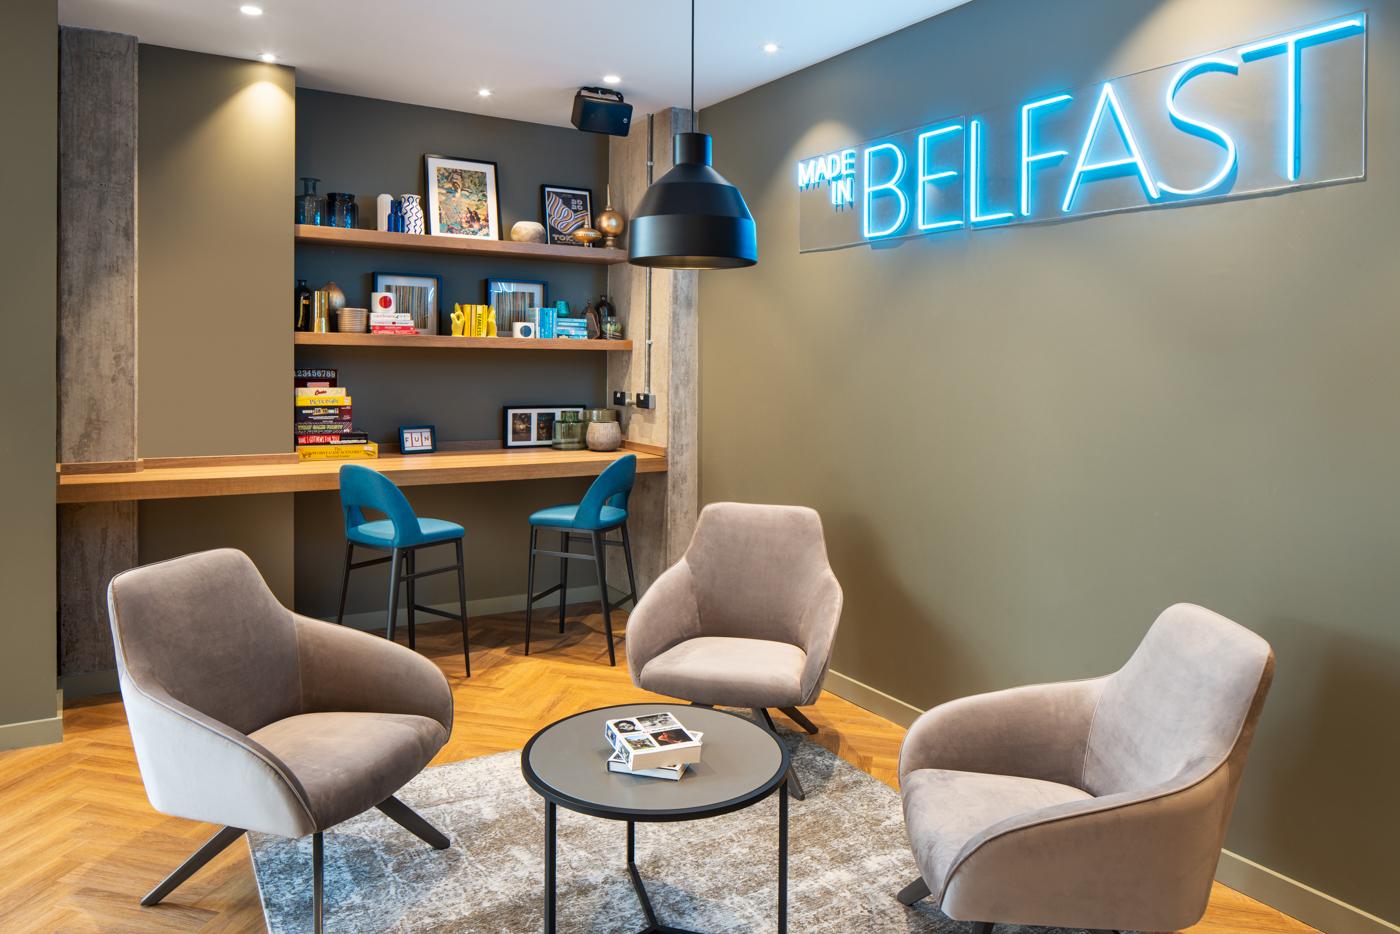 Belfast welcomes 'new era in student LIVing' image